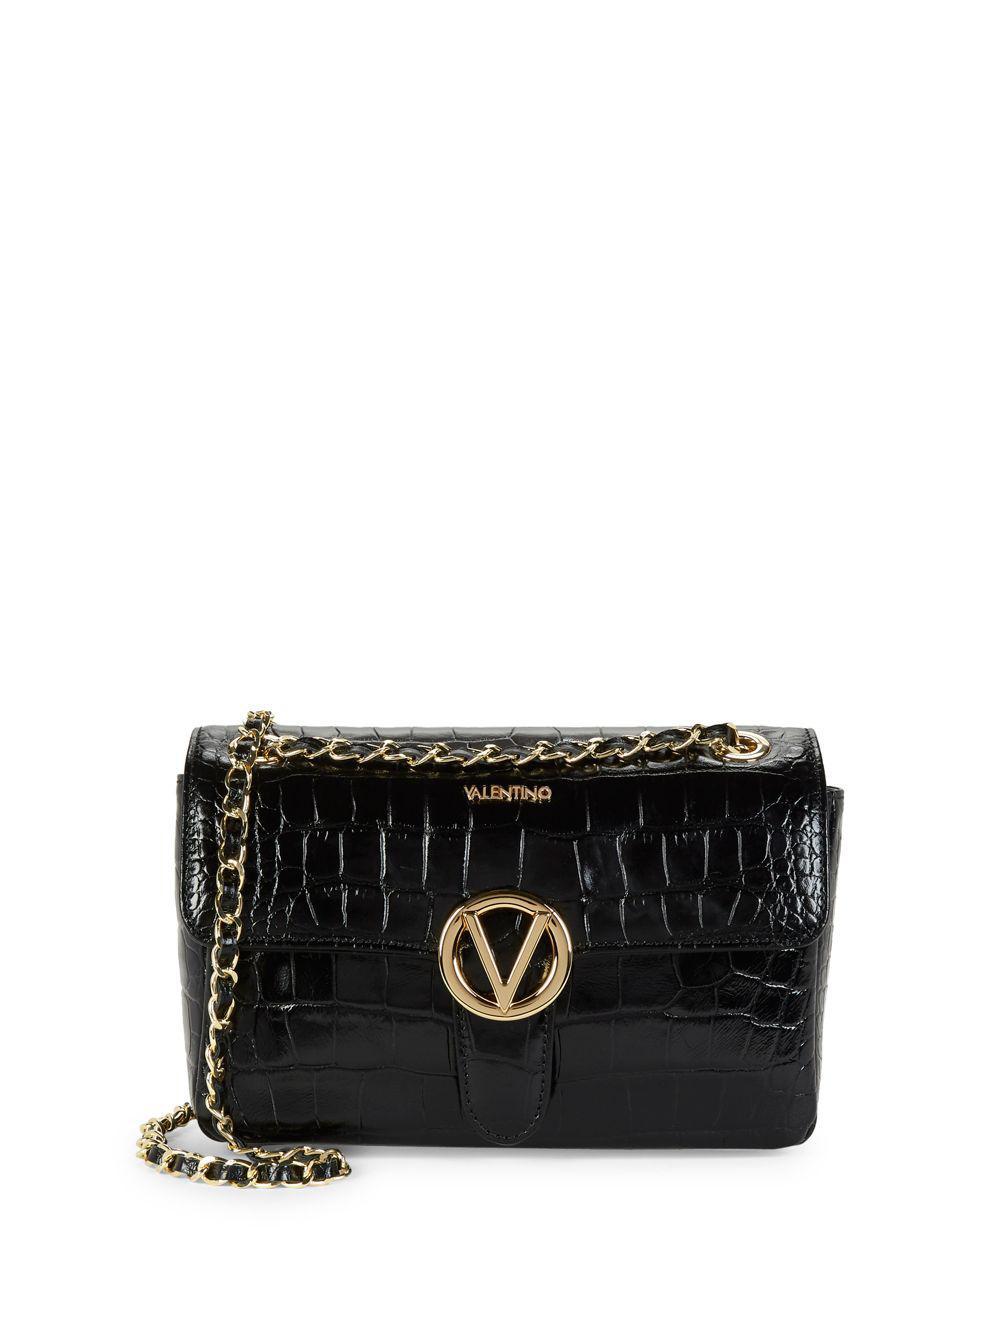 a0d6a20fbb30 Valentino By Mario Valentino. Women s Black Antoinette Crocodile Leather  Crossbody Bag